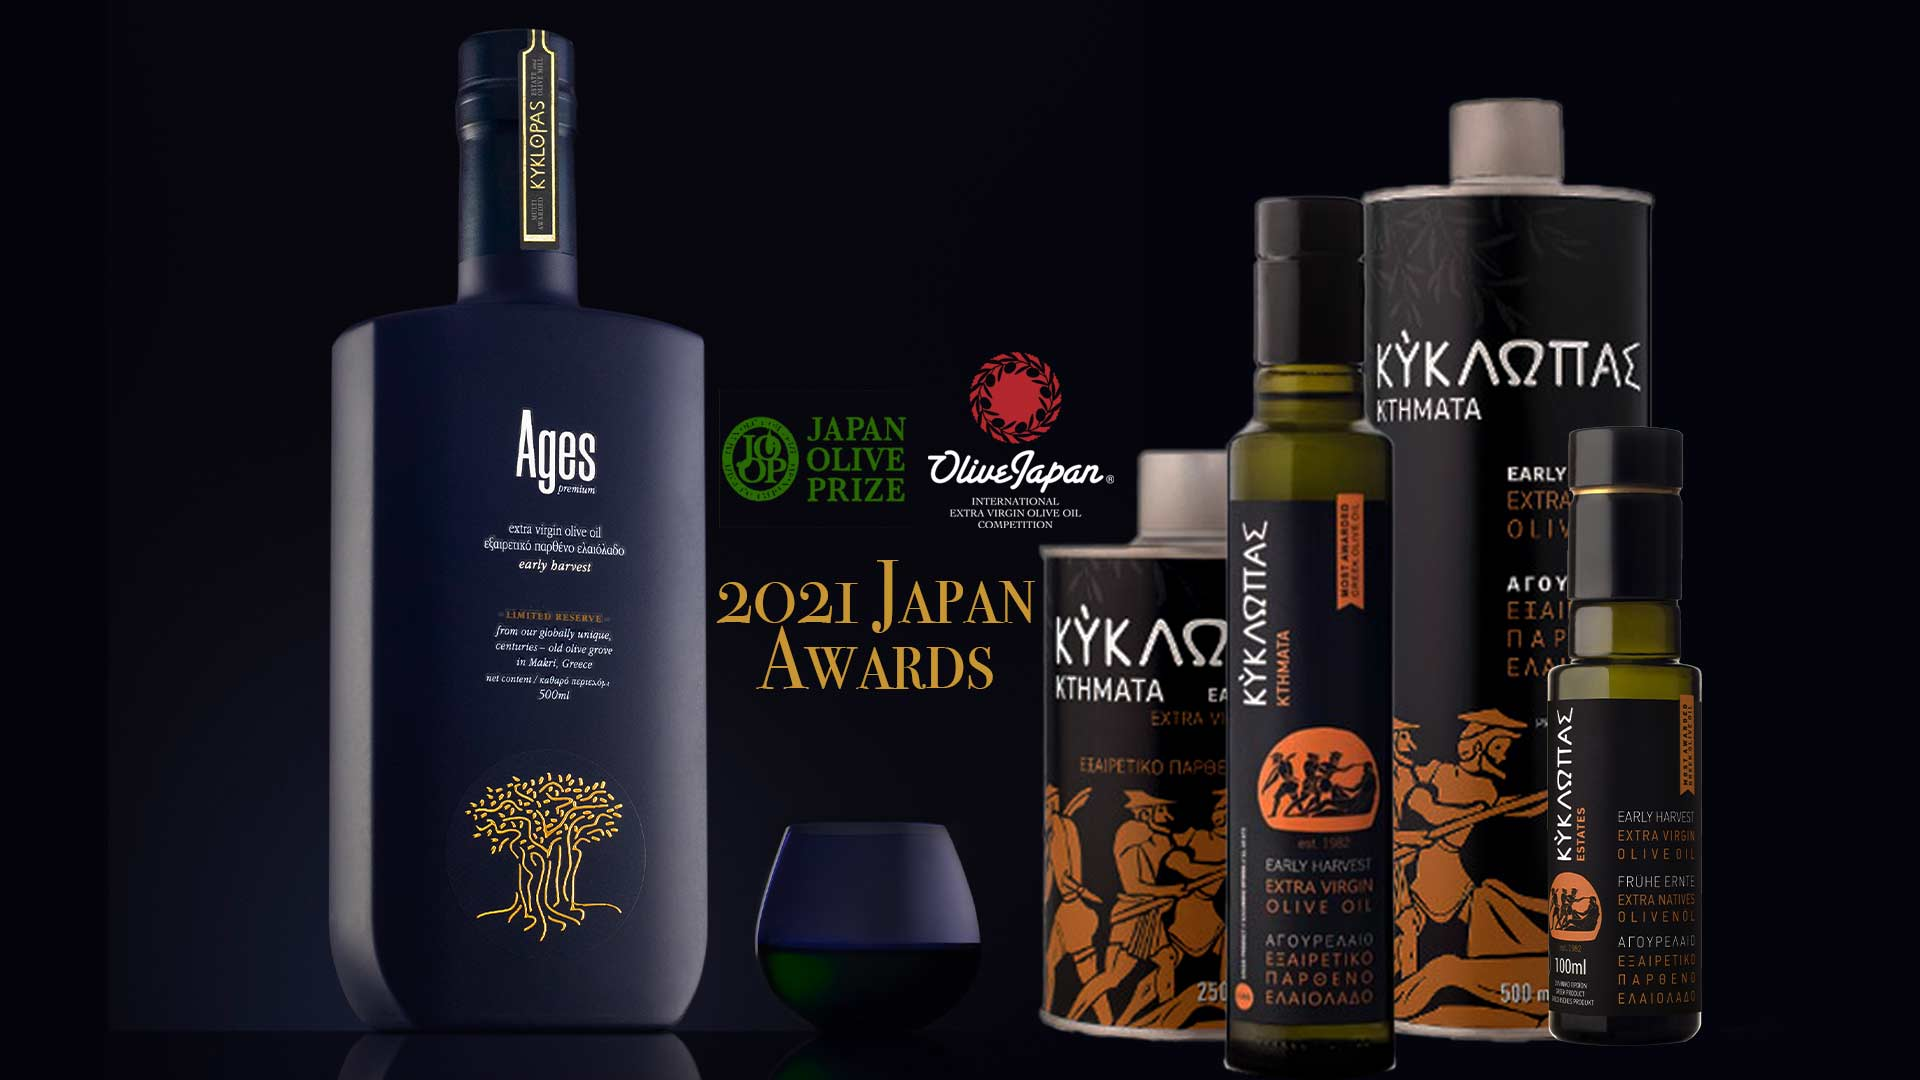 Kyklopas Awards Japan 2021